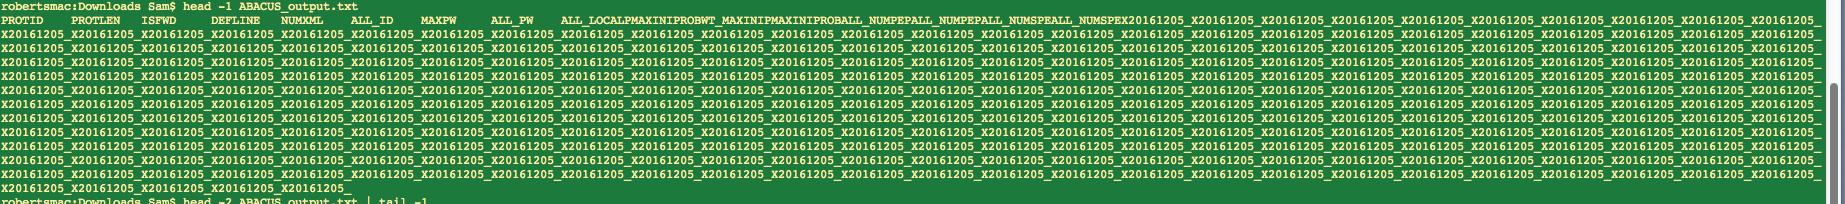 screenshot 2017-02-08 09 29 49